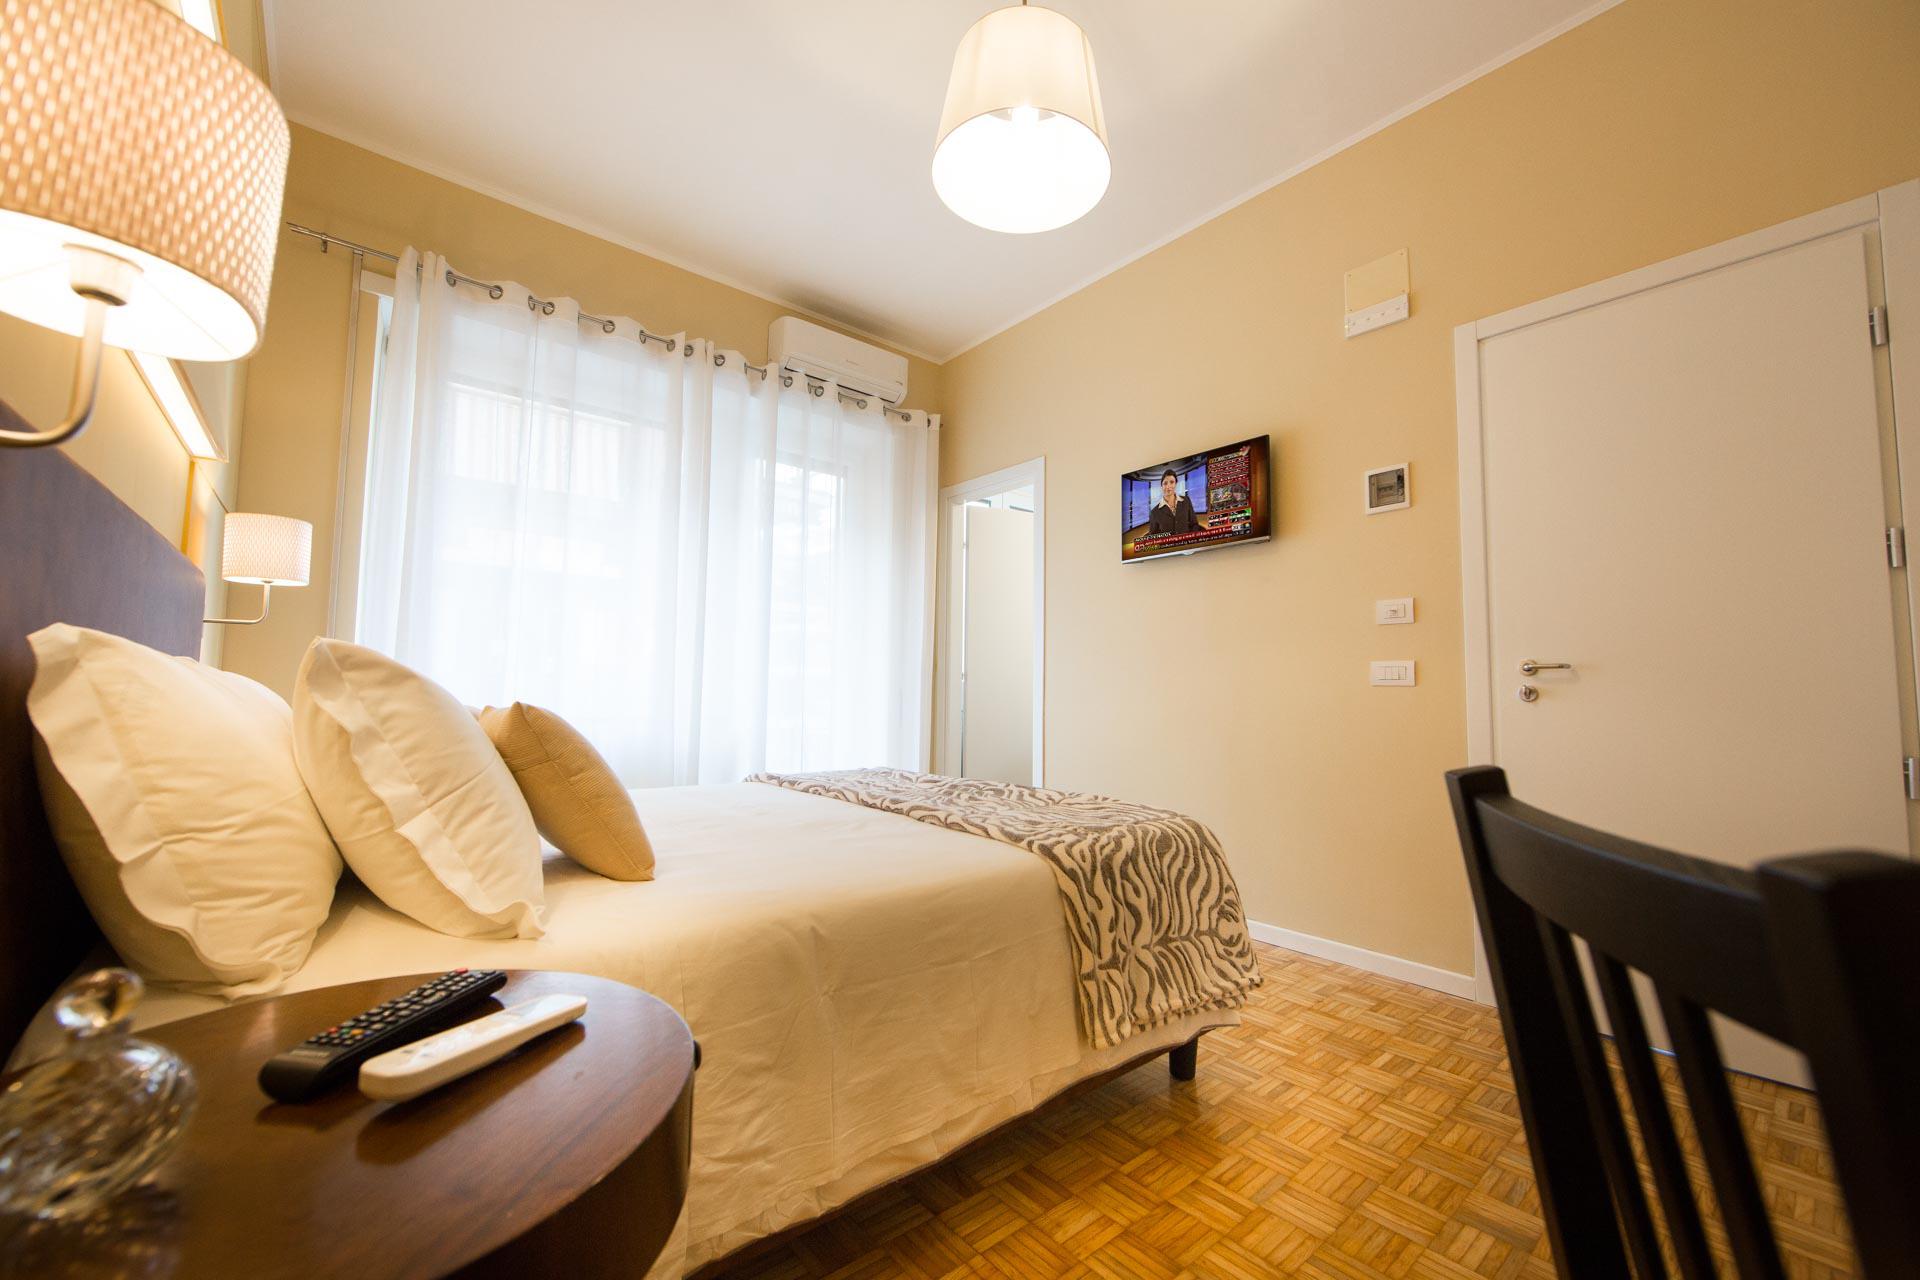 bed-and-breakfast-rome-Mediterranean-lounge-room-edit